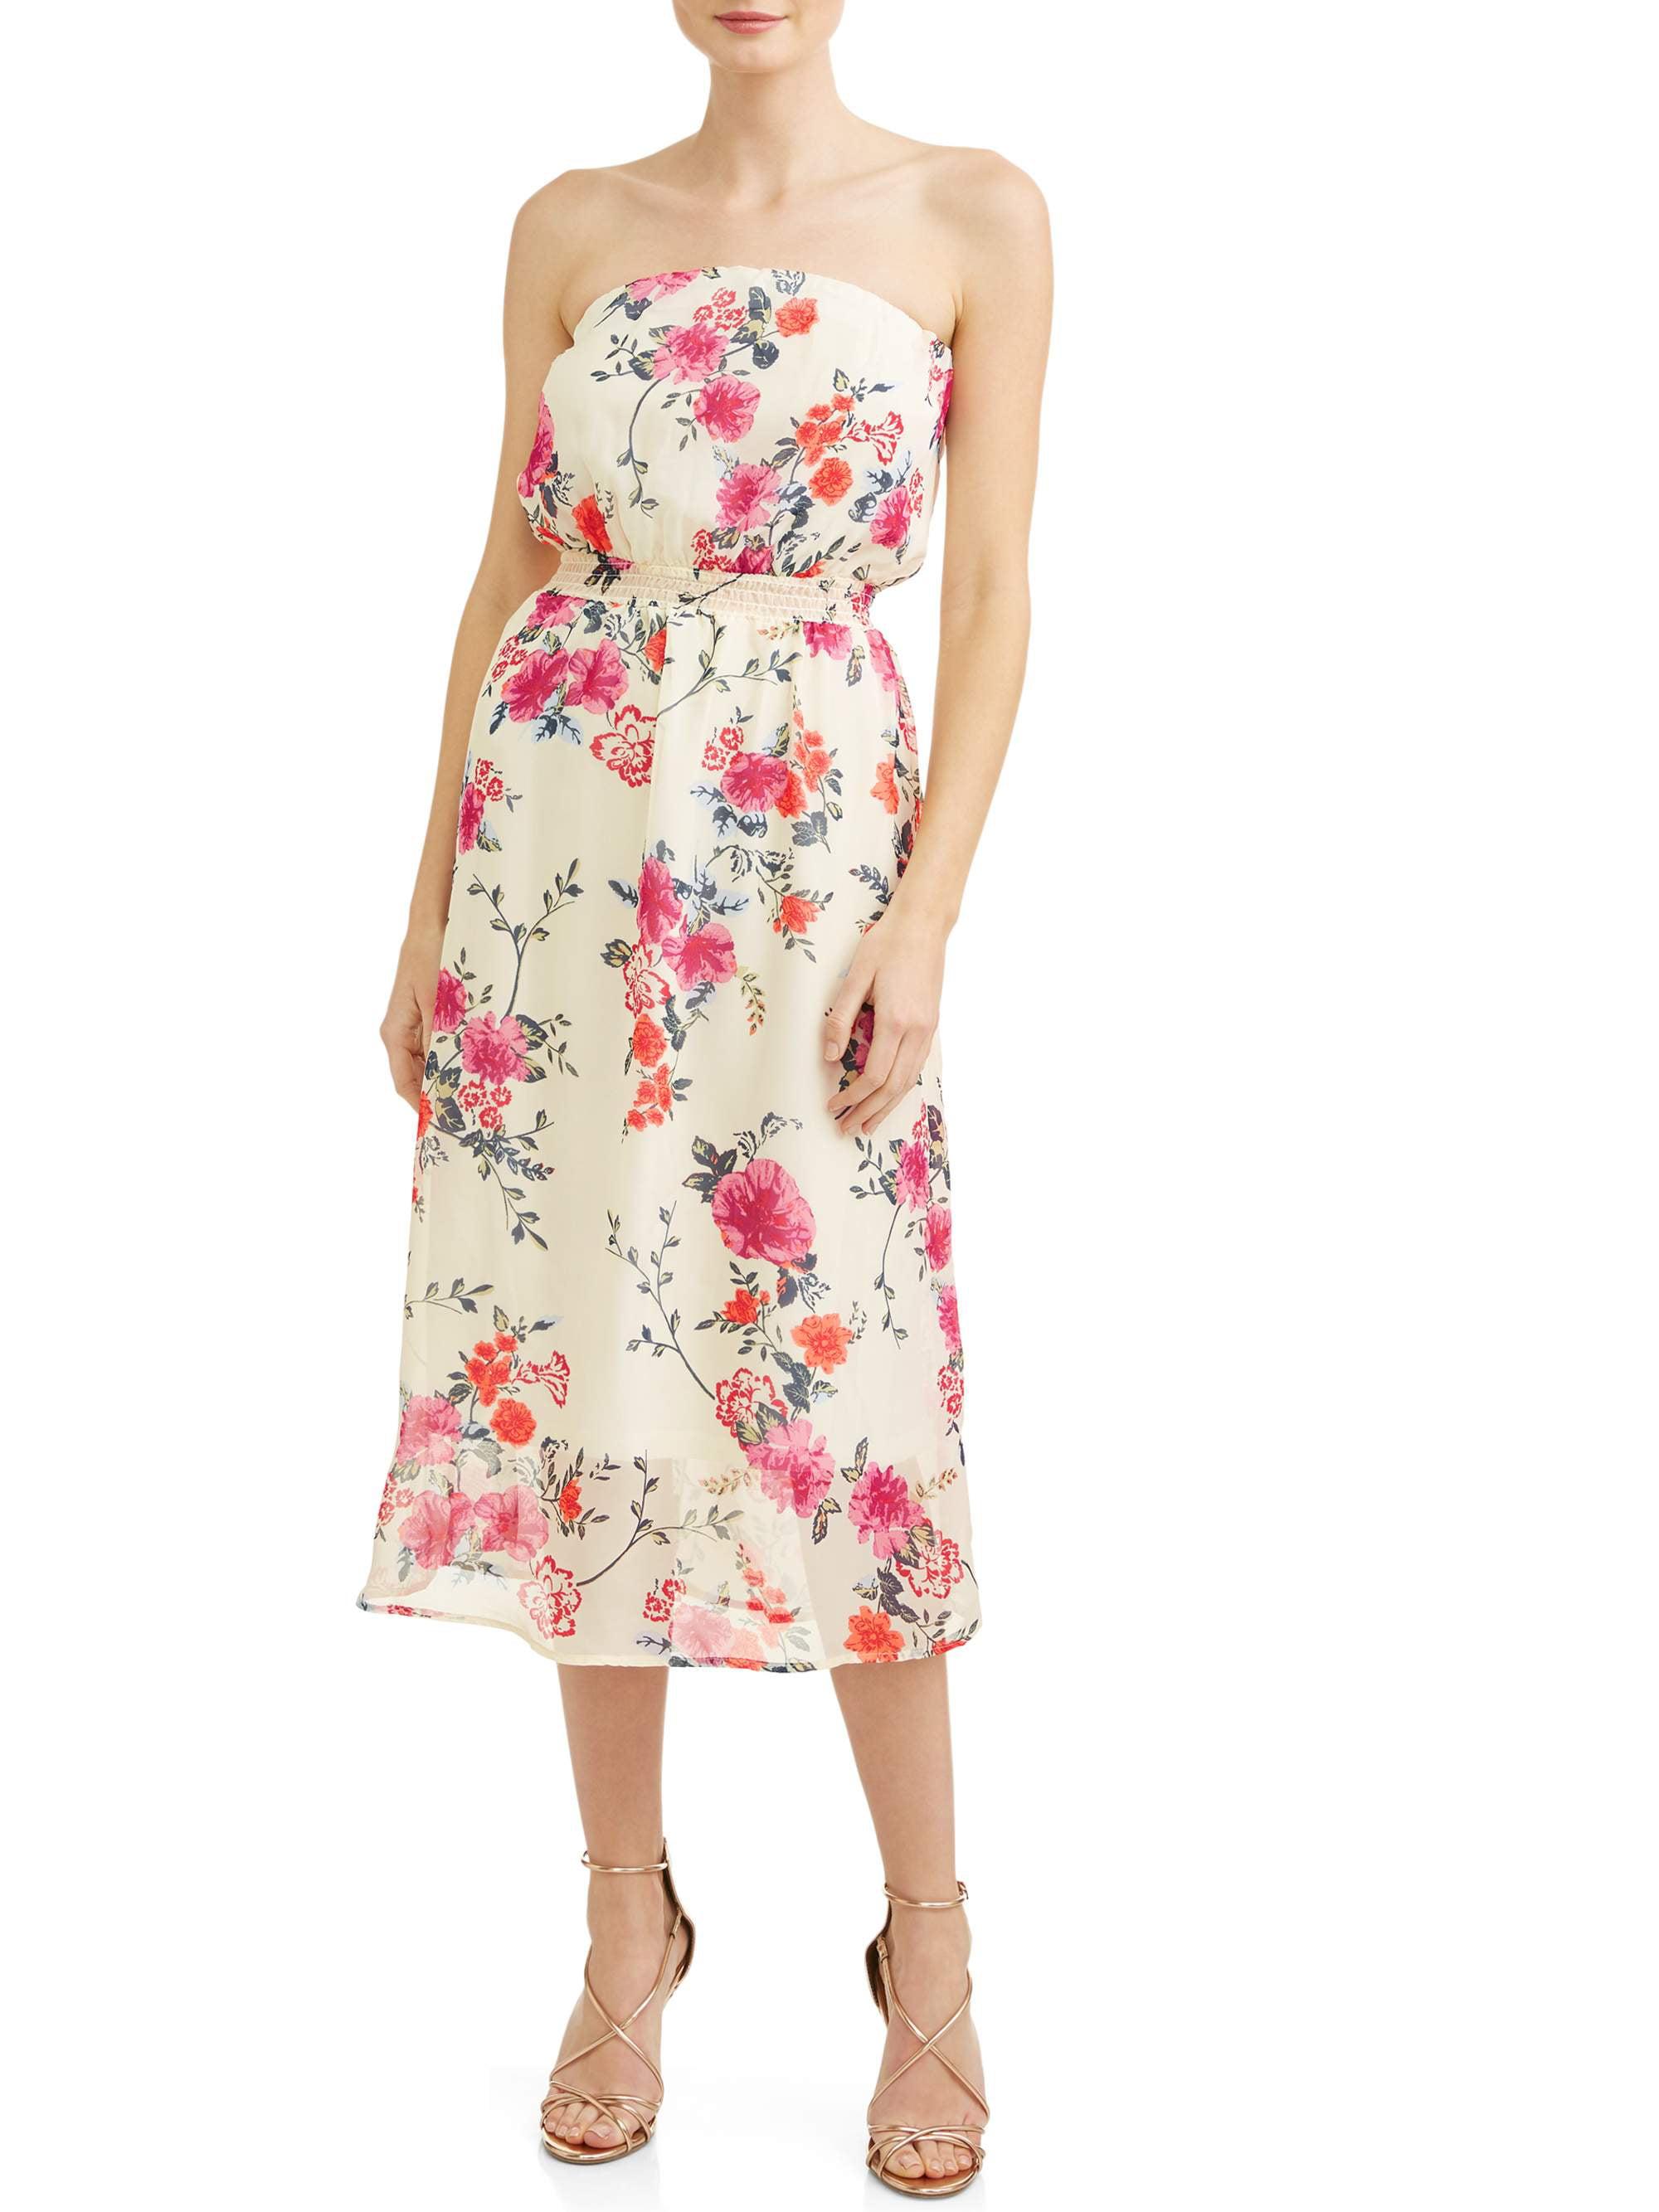 Junior's Floral Dress